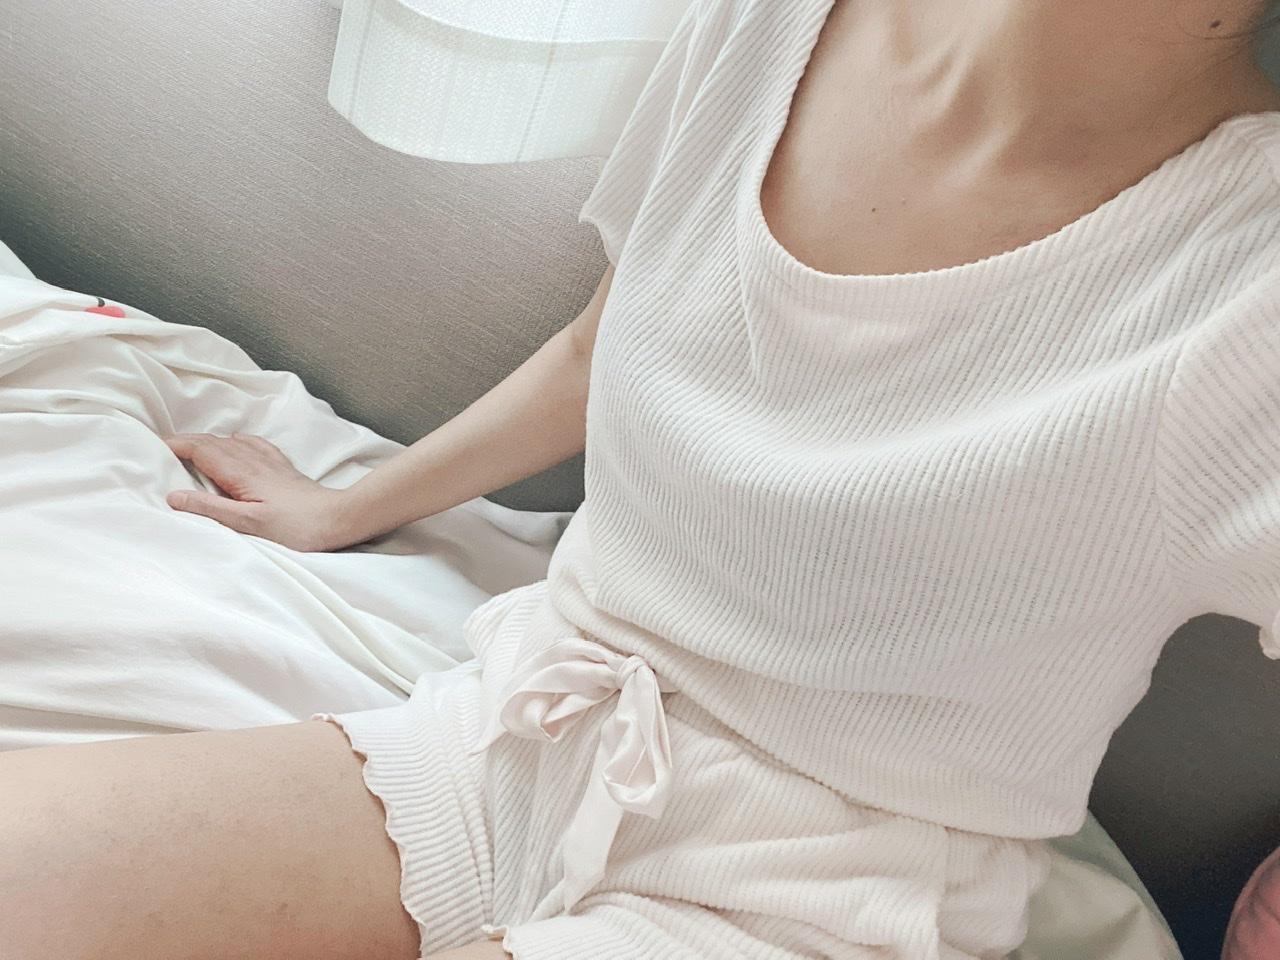 【GU】大絶賛の嵐!新作パジャマが史上最高の可愛さ♡《ラウンジセット¥1,490》は絶対買い!_3